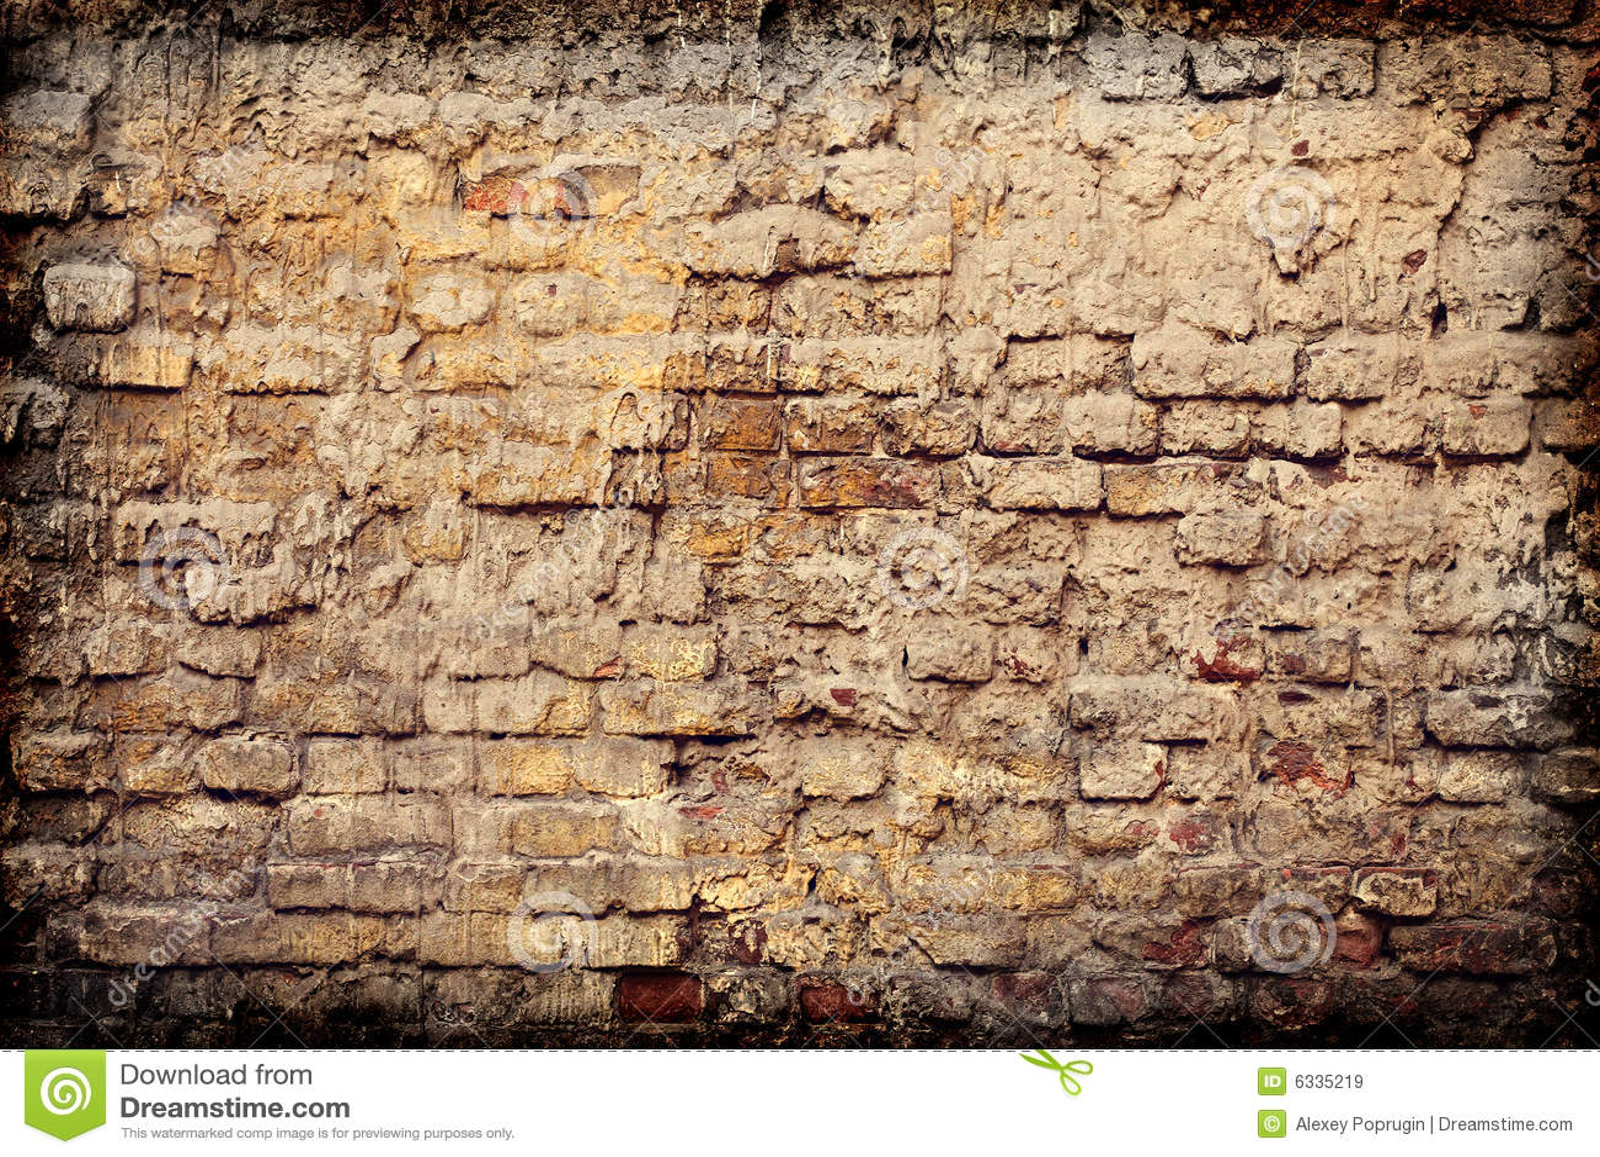 Old Brick Wall Royalty Free Stock Images Image 6335219